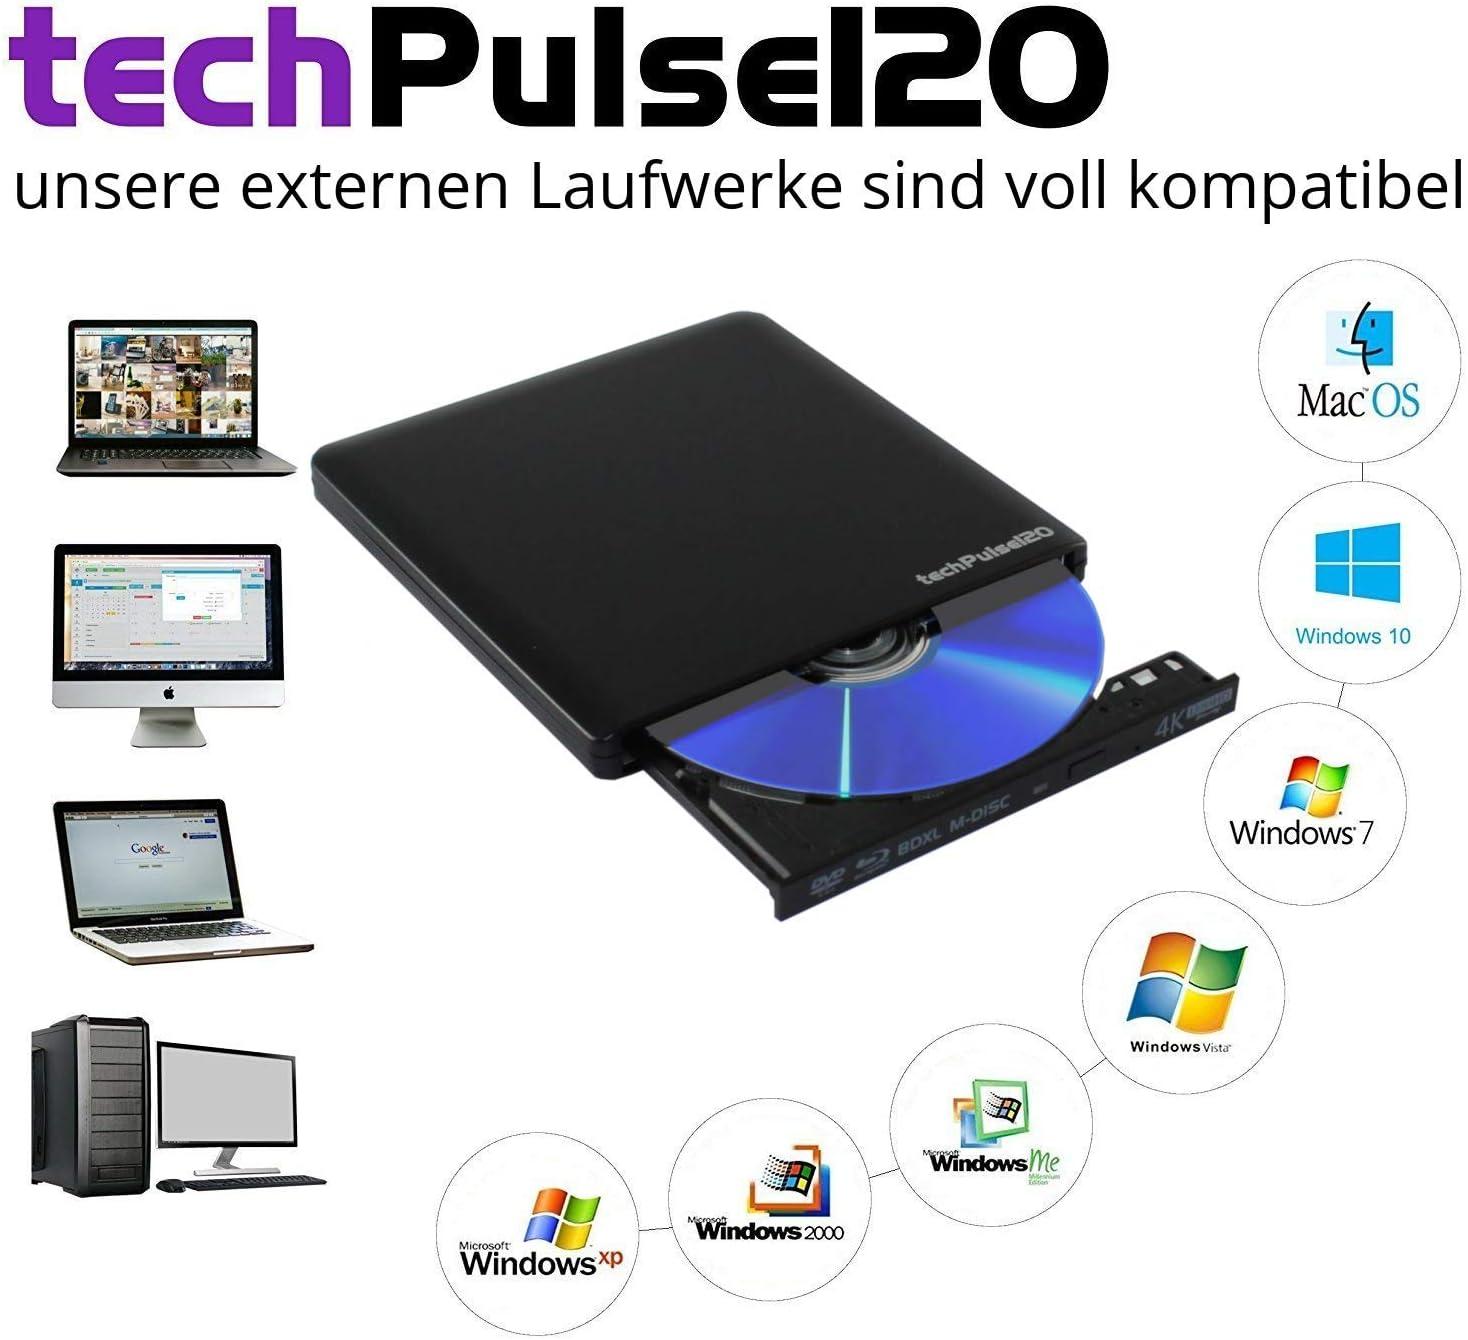 Grabadora de BLU-Ray techpulse120/V2.2 Aluminio Negro UHD BLU-Ray Brenner USB xDeluxe Paket